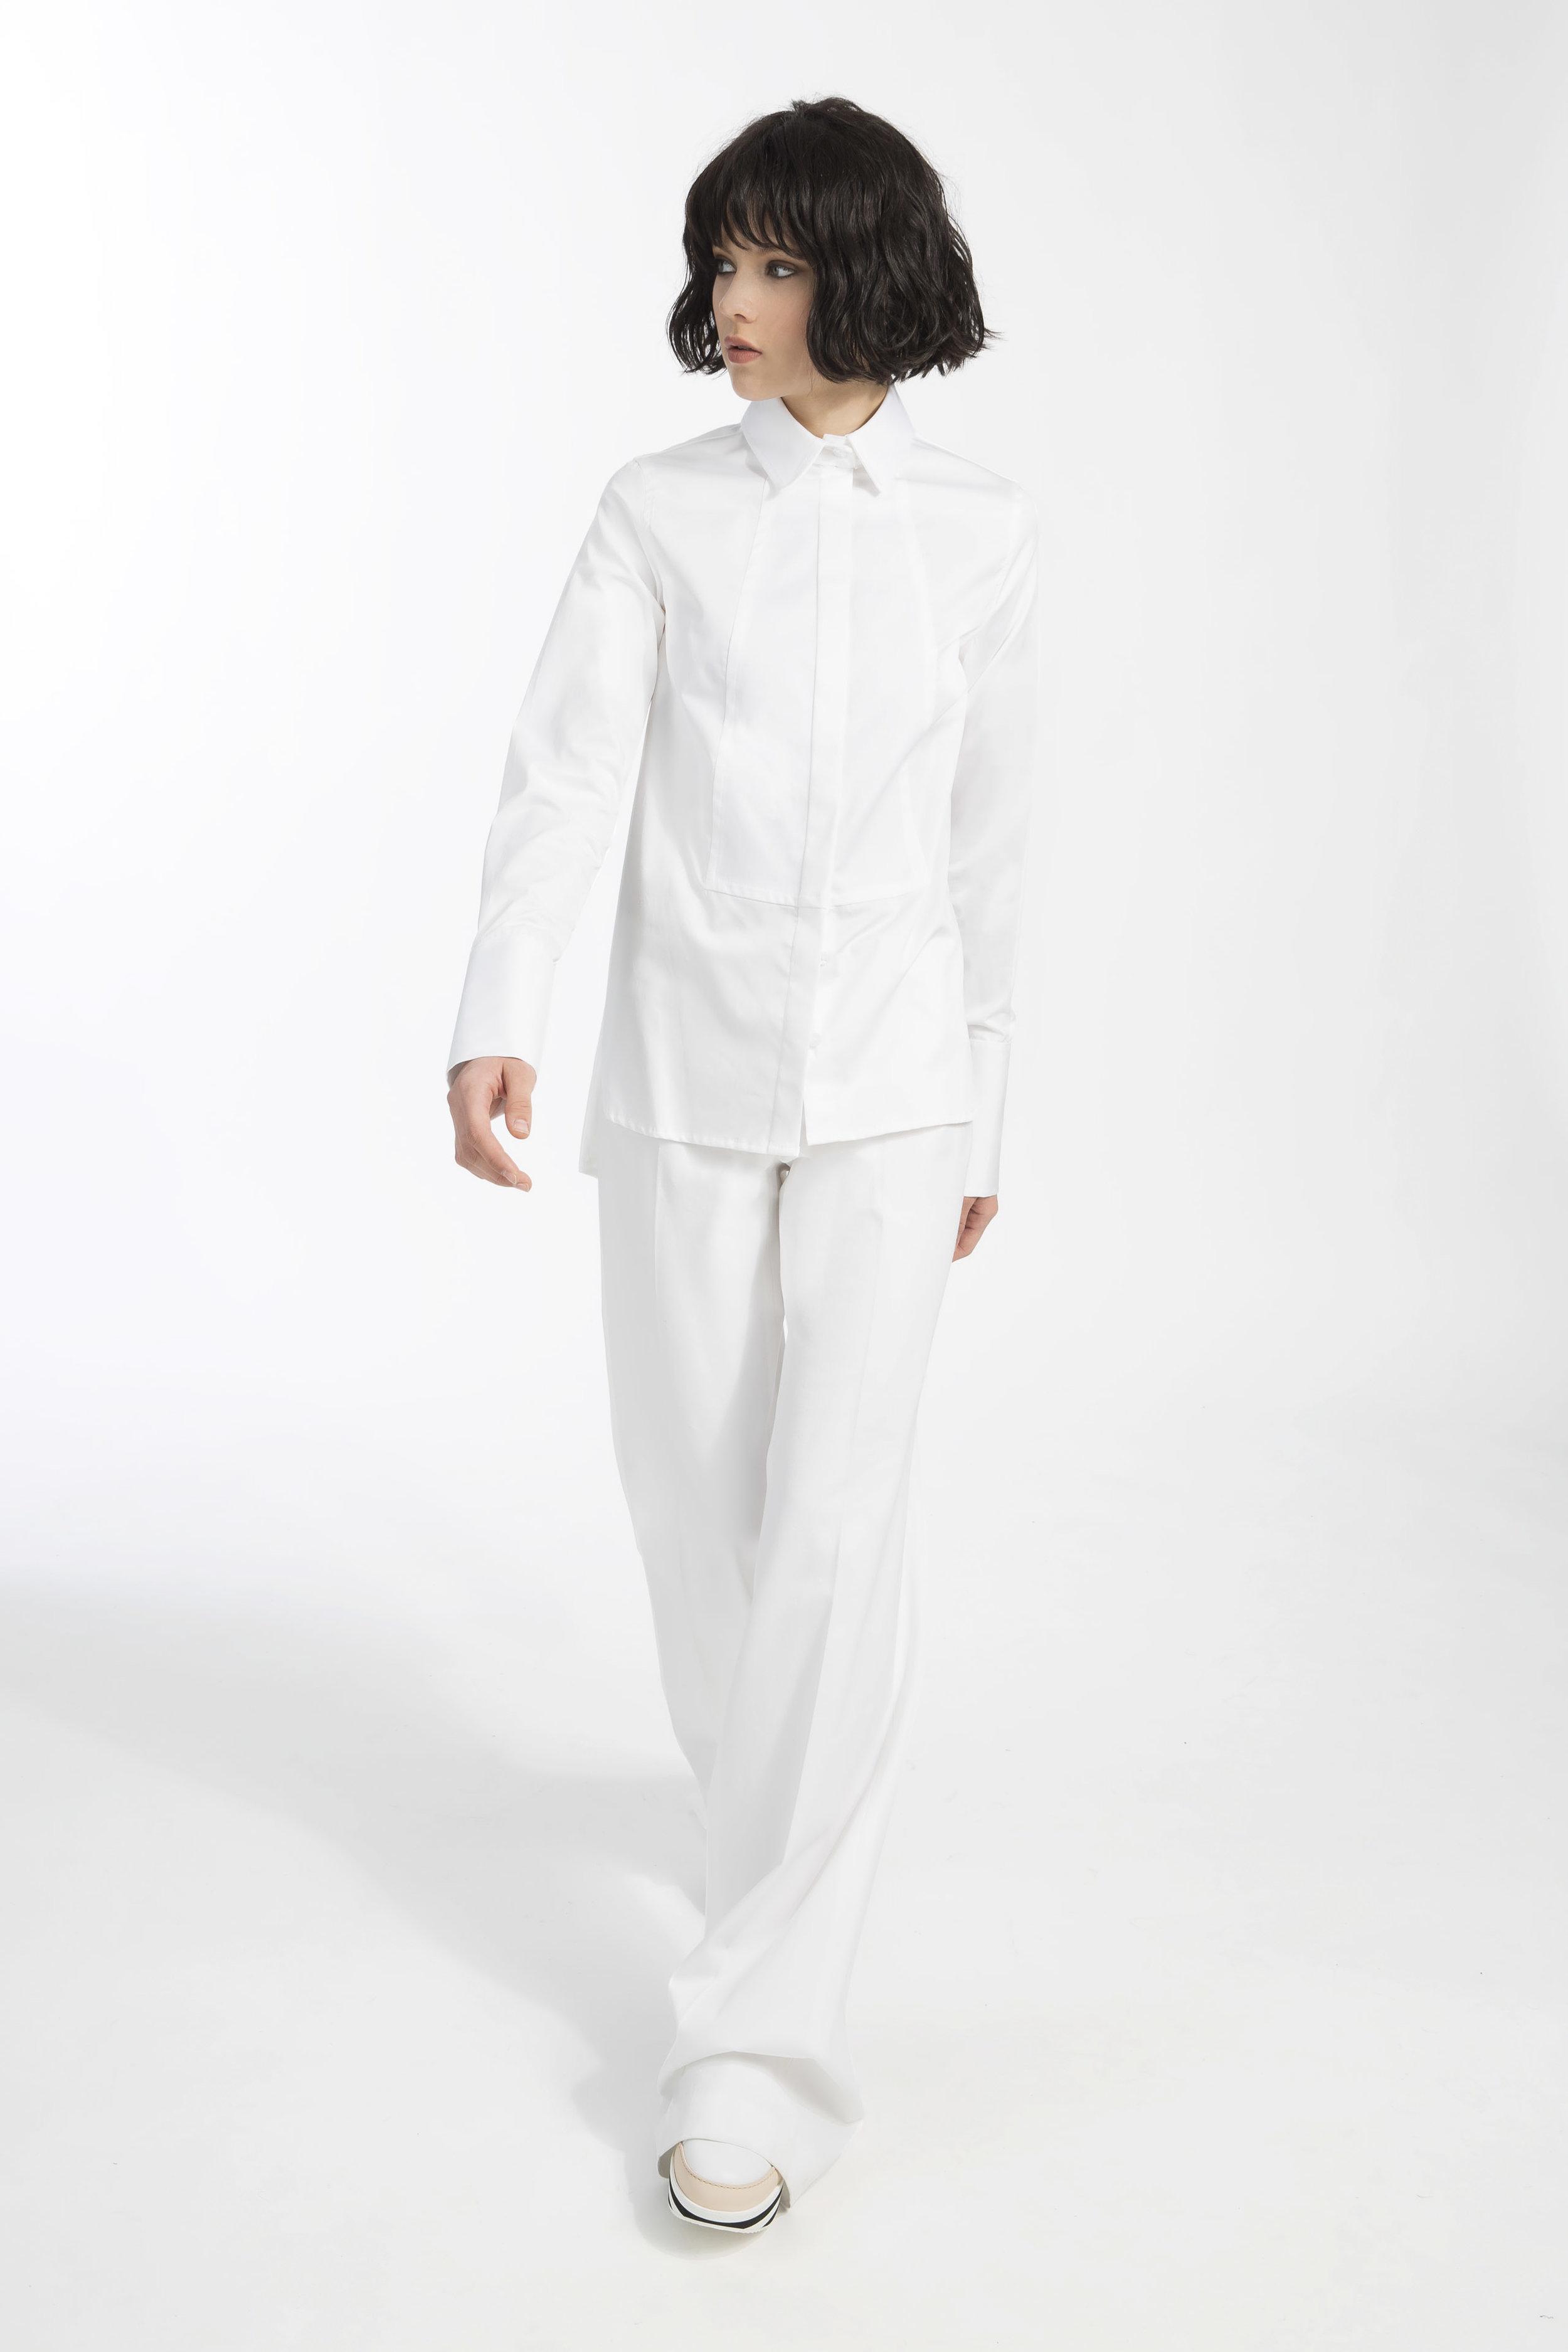 Deena shirt - White popeline cotton shirt